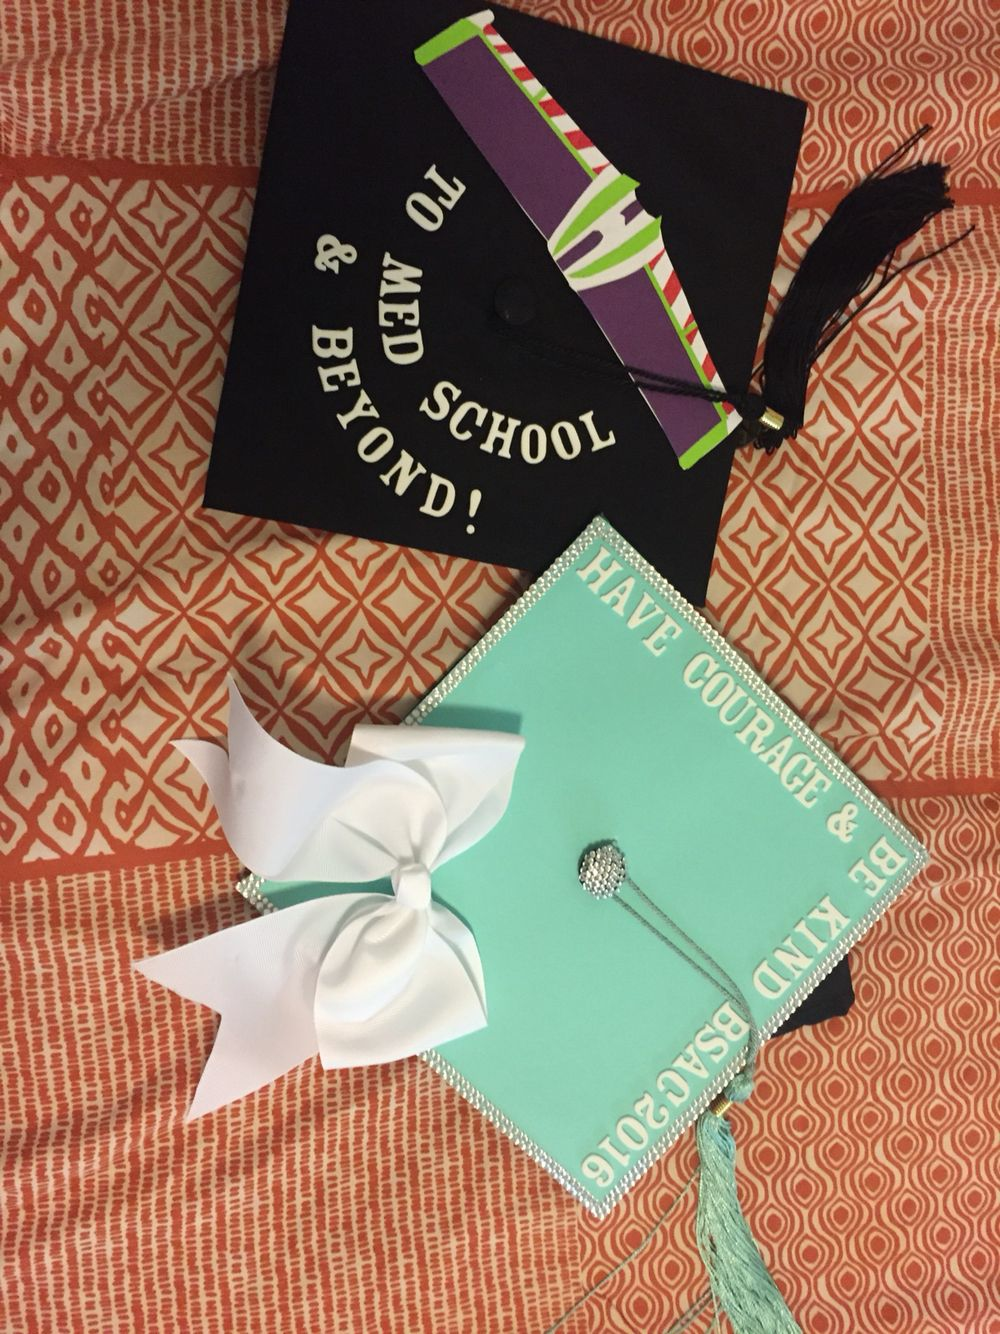 Uncategorized Paper Graduation Caps graduation caps i decorated for me and my boyfriend materials glue gun